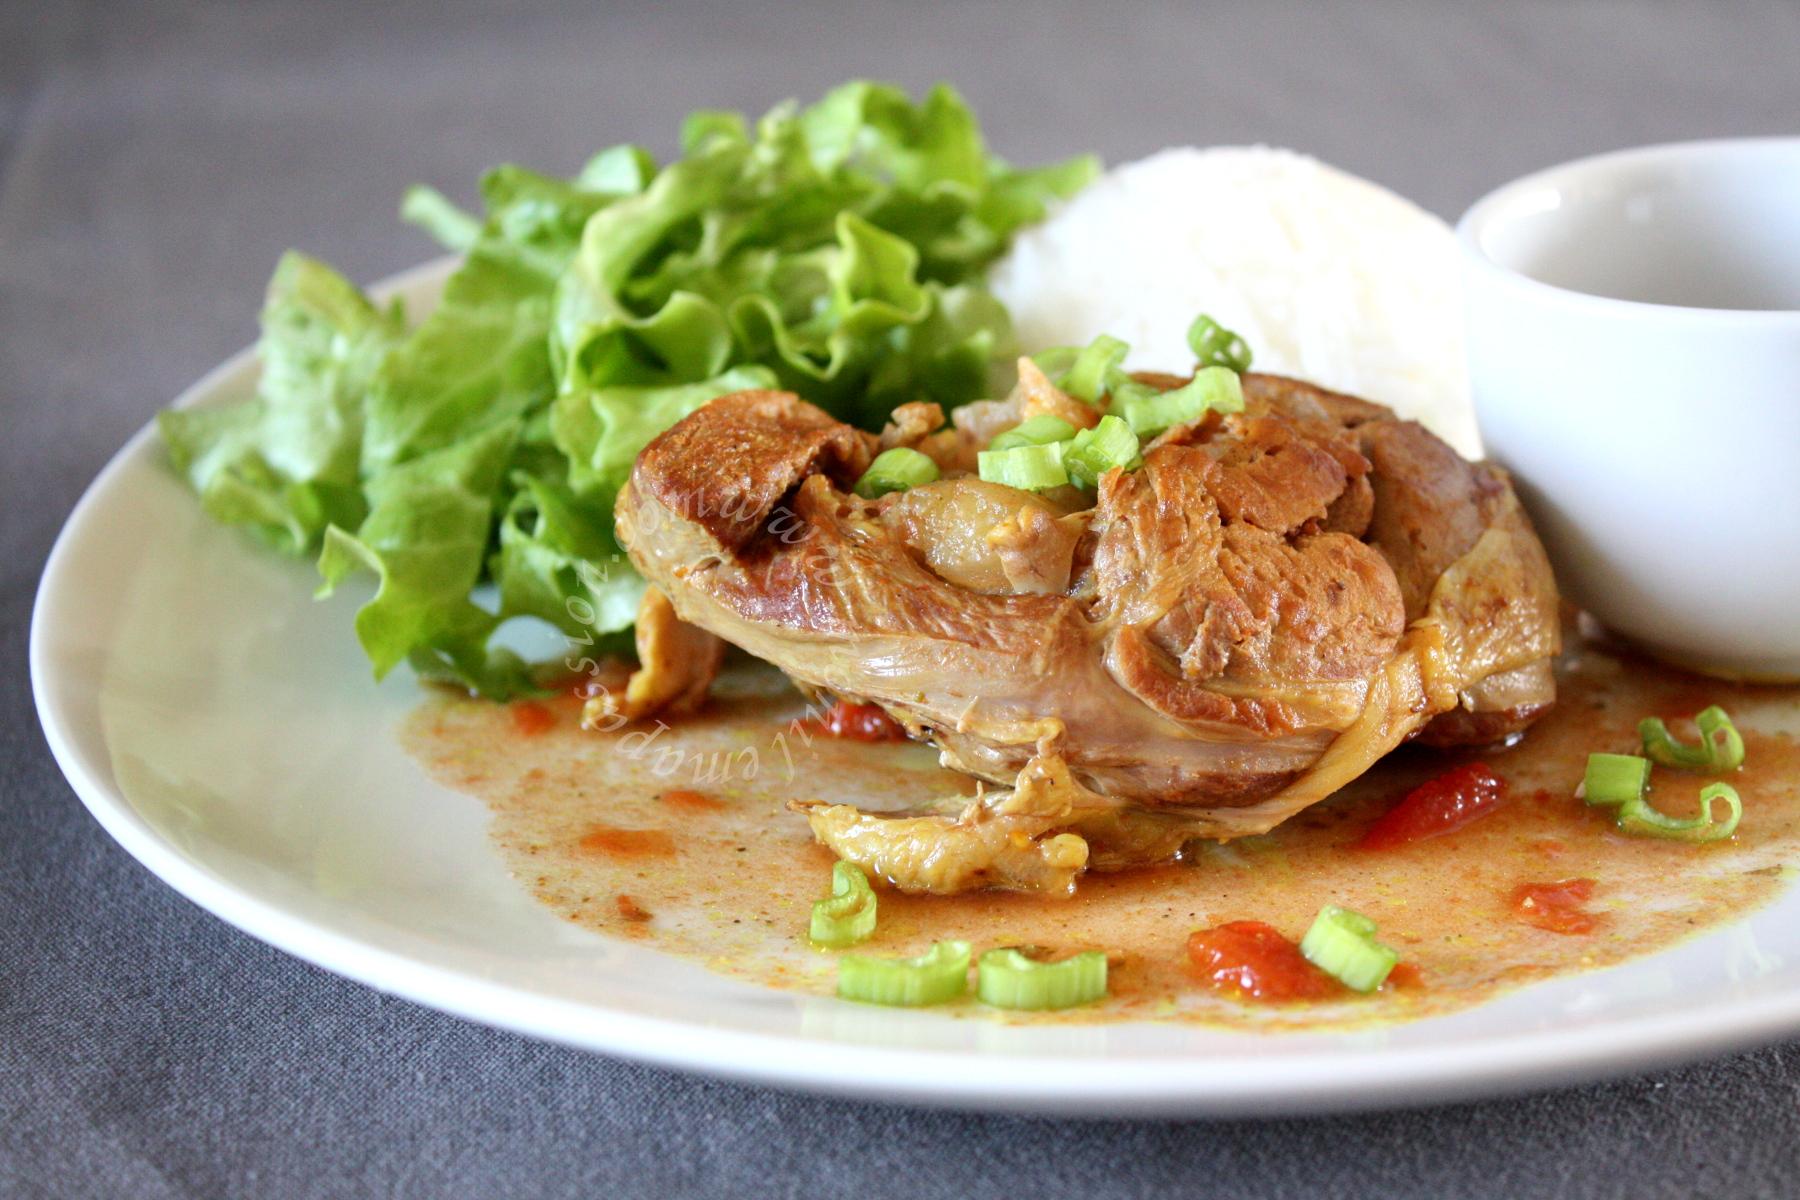 Osso bucco de dinde au Ras-el-hanout – Crock-Pot Moroccan Spiced Turkey Osso Buco